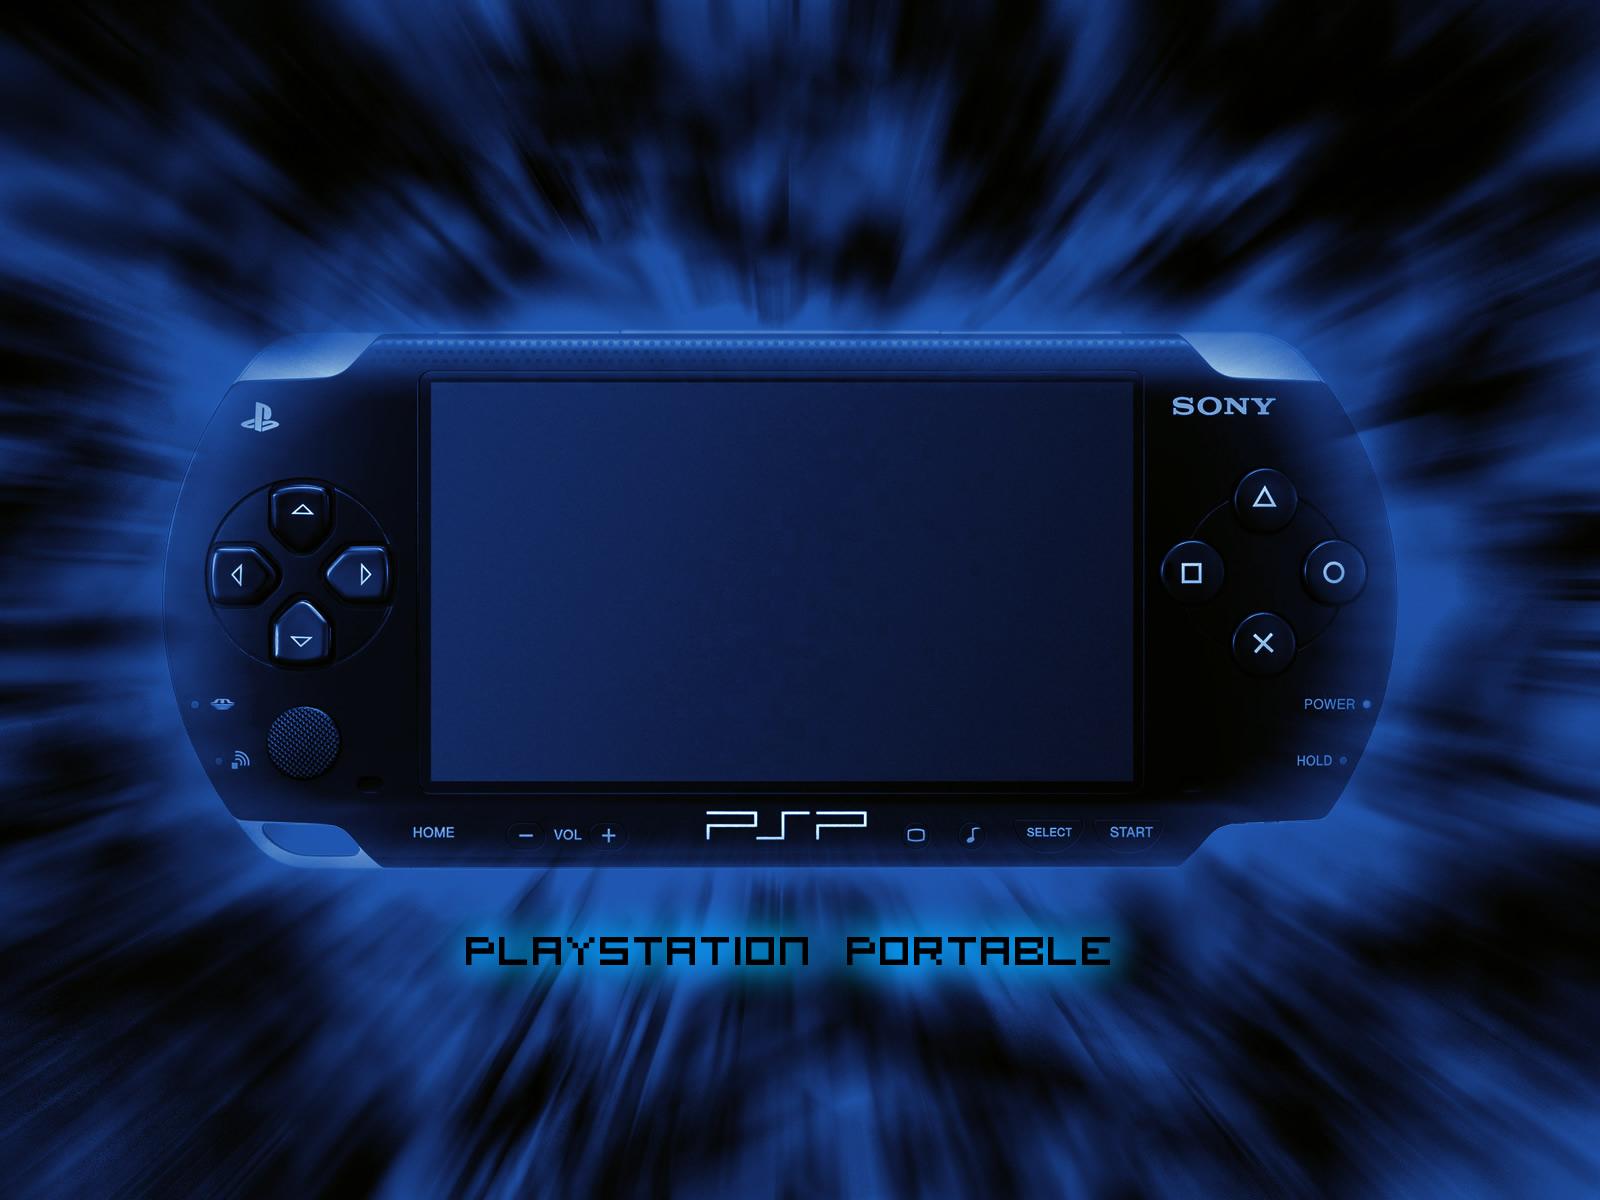 Playstation Portable Psp Desktop Wallpaper